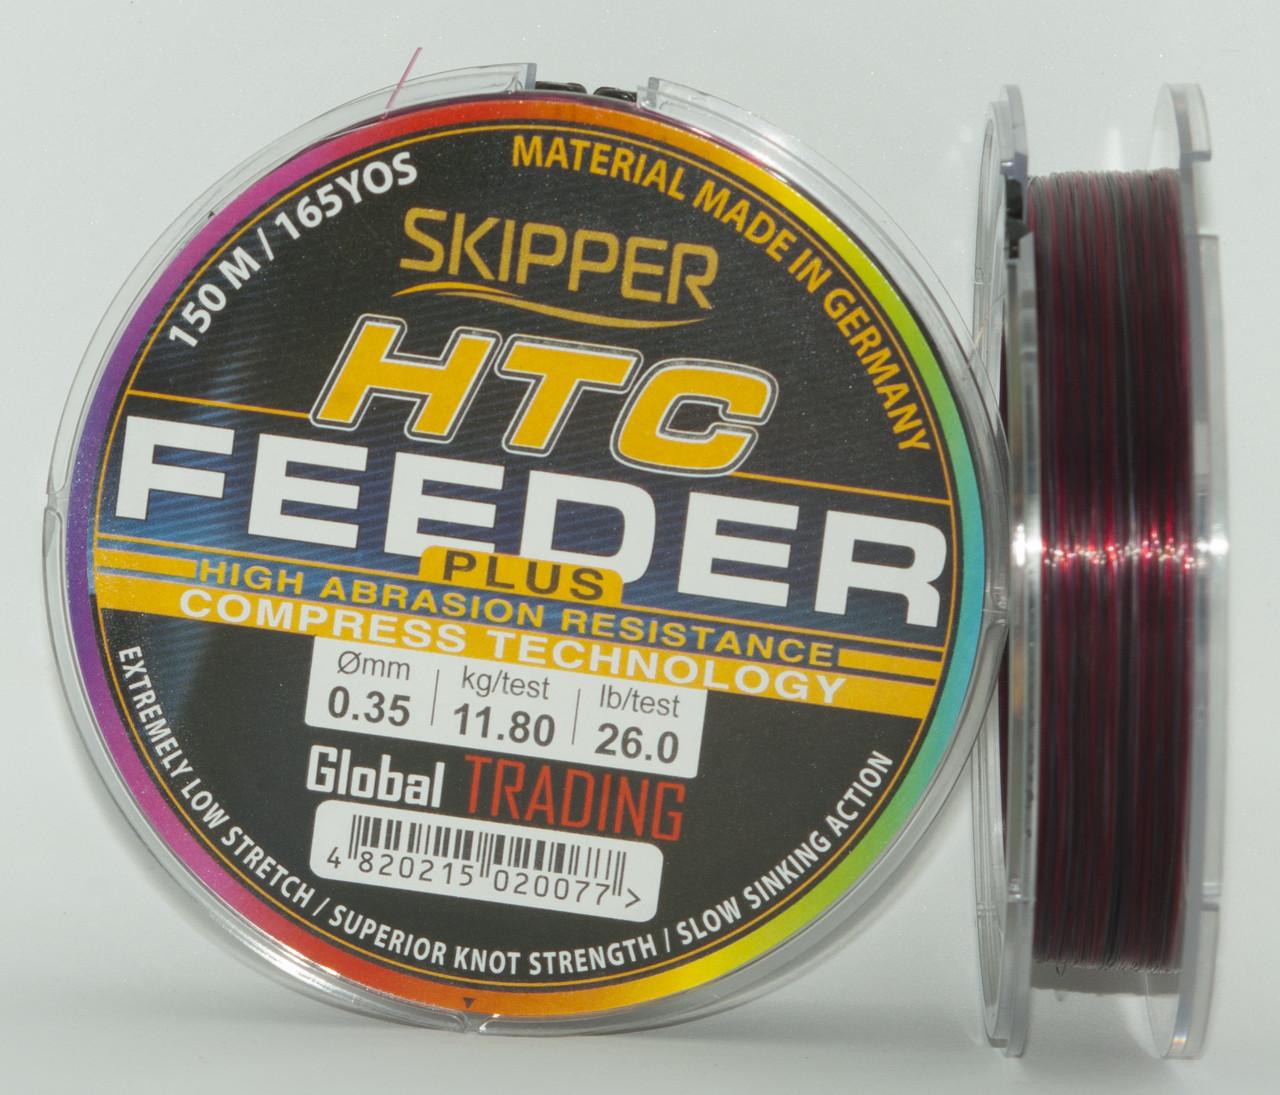 Леска Skipper HTC Feeder диаметр 0,35мм 150м